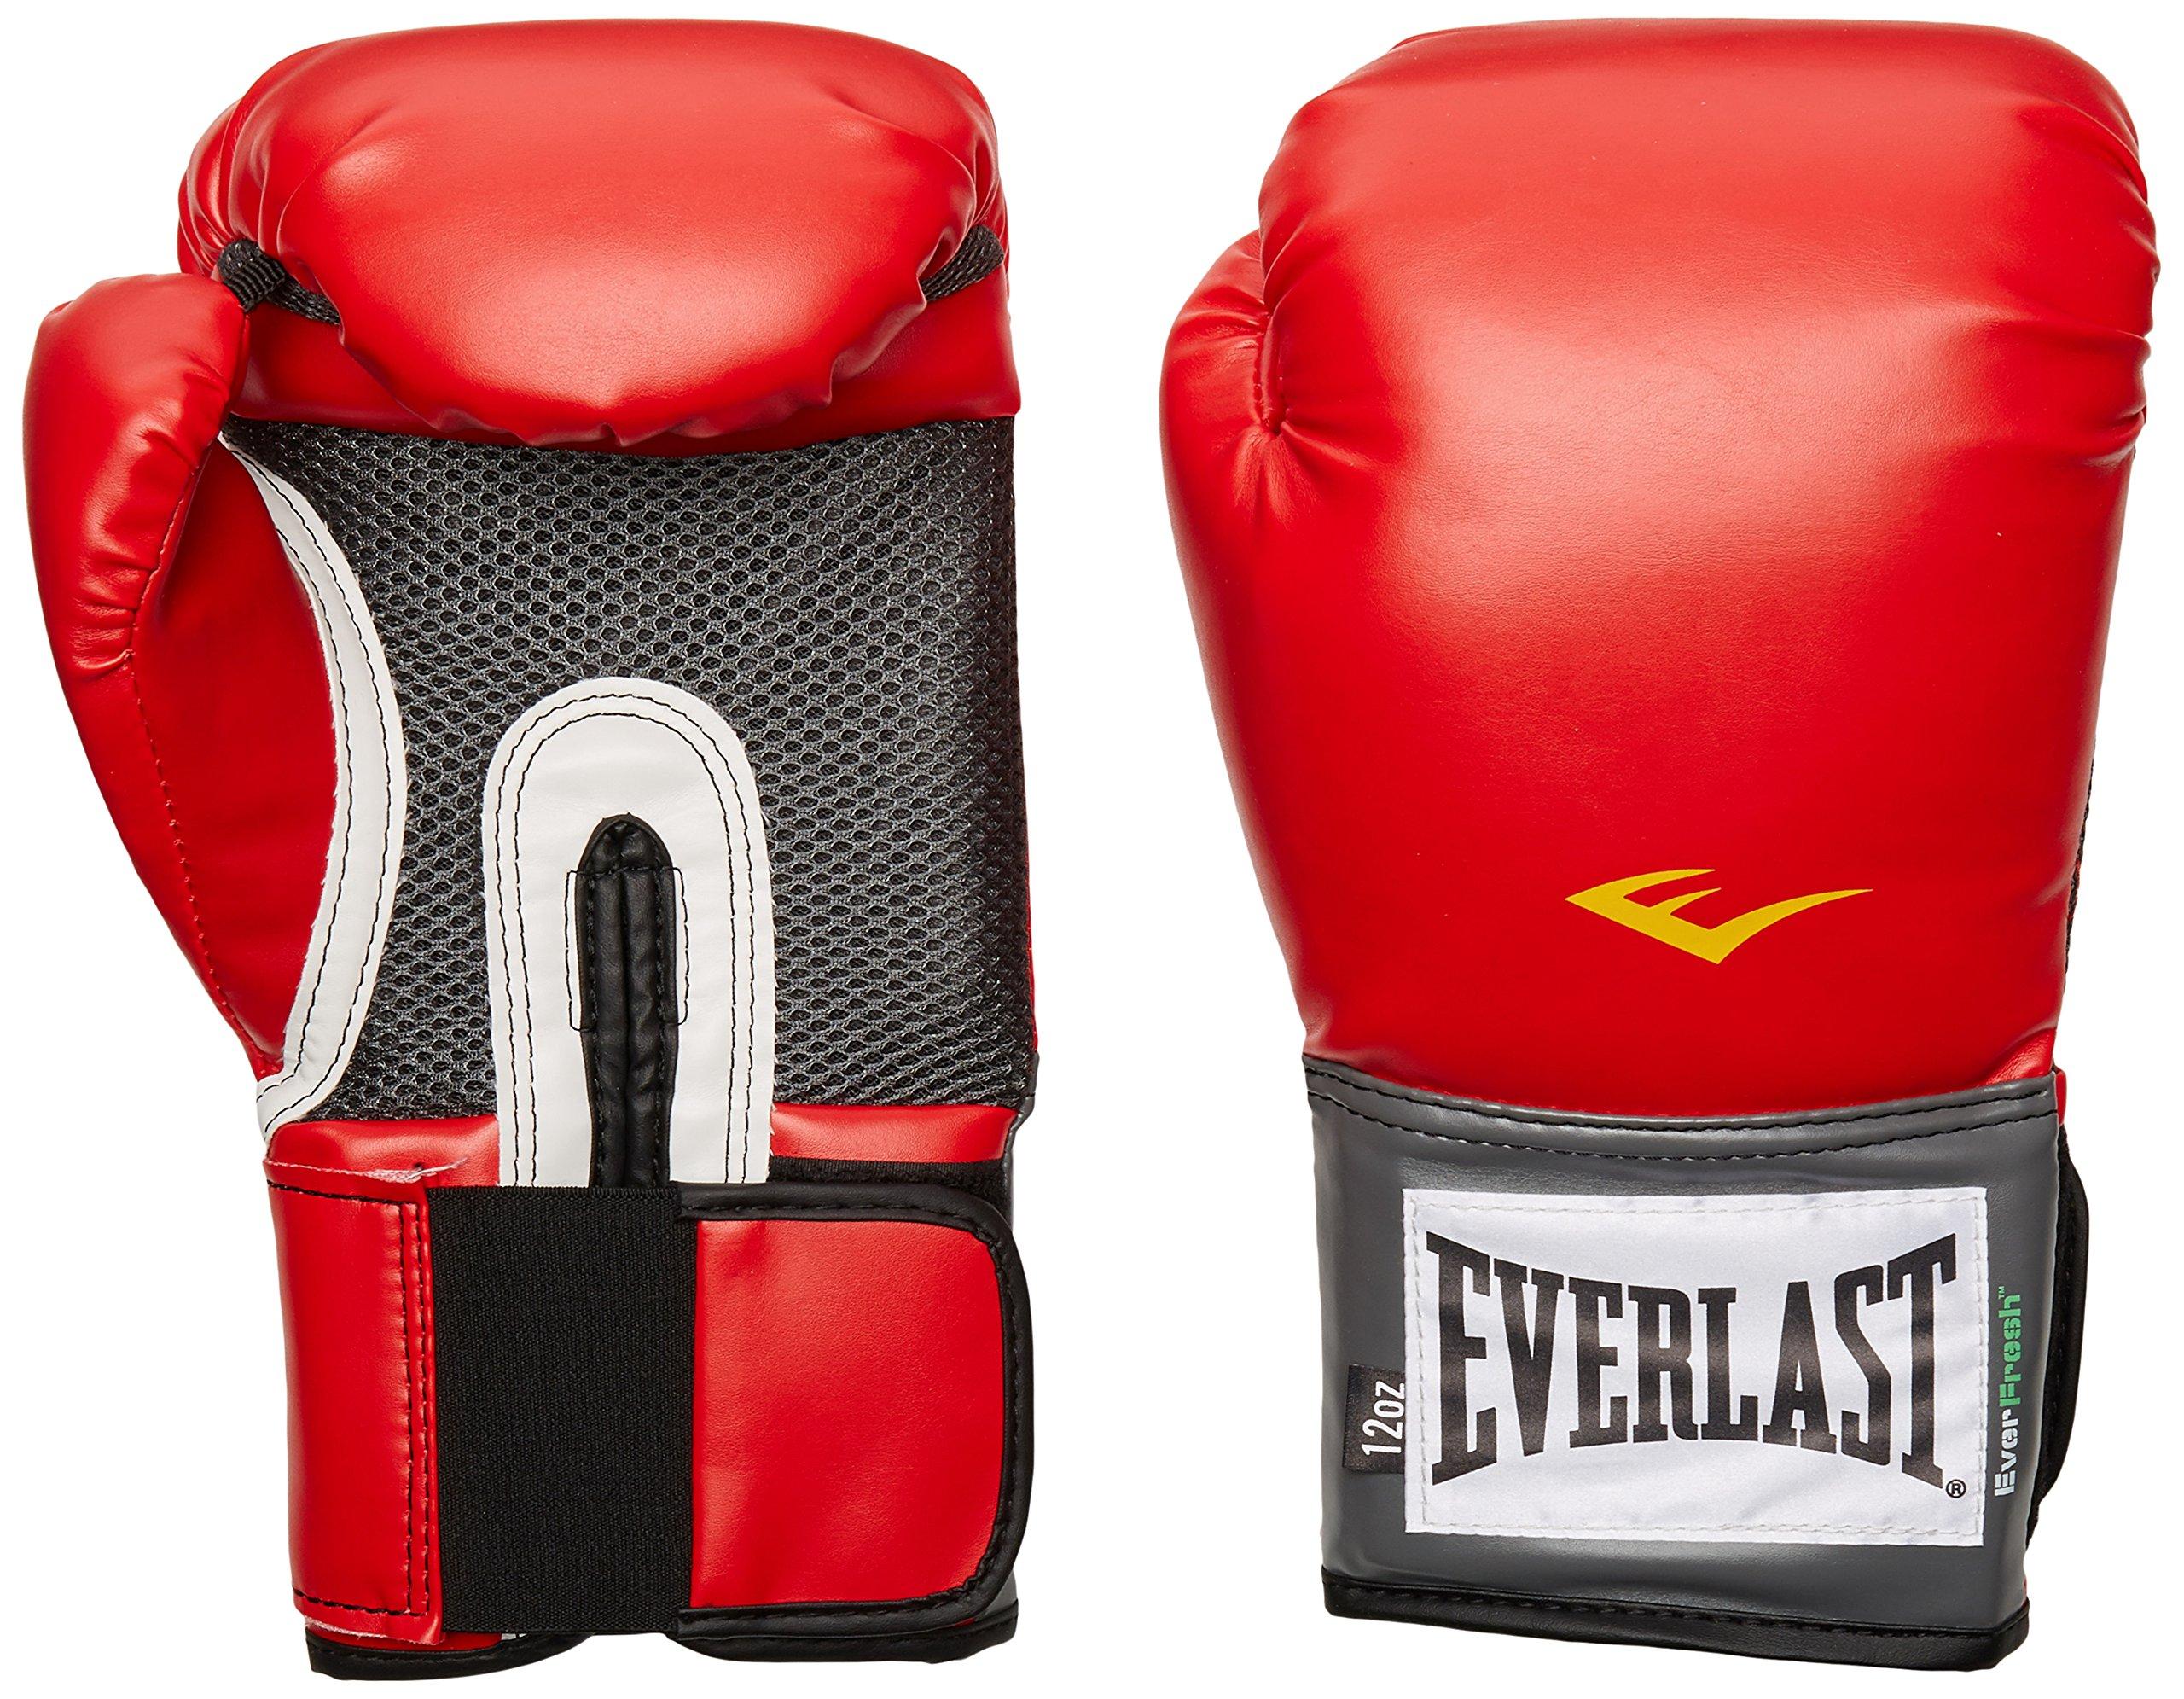 Everlast Pro Style Training Gloves (Red, 12 oz.)